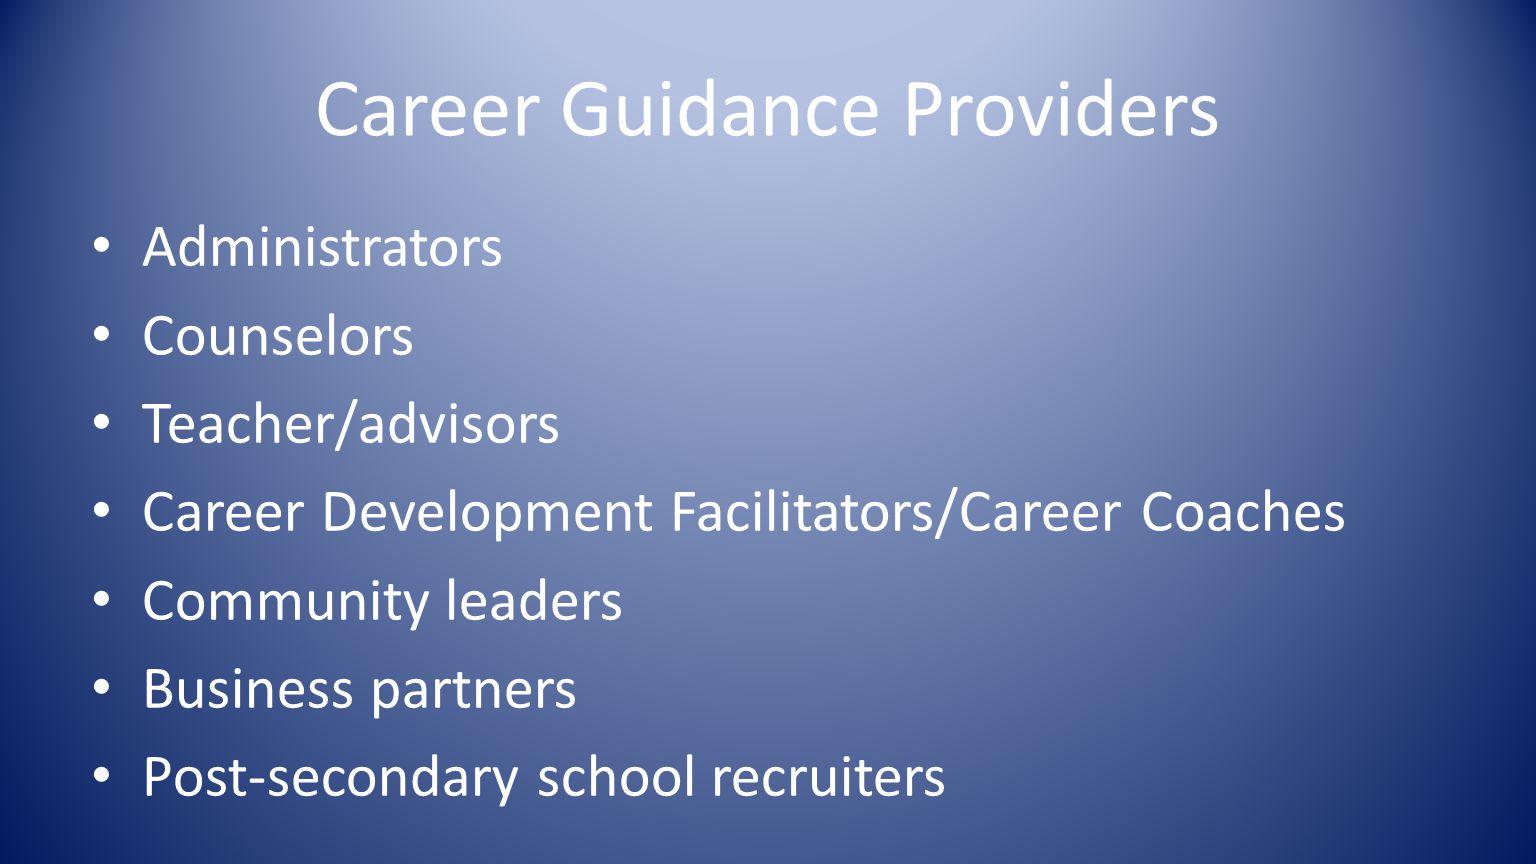 Career Guidance Providers Administrators Counselors Teacher/advisors Career Development Facilitators/Career Coaches Community leaders Business partners Post-secondary school recruiters